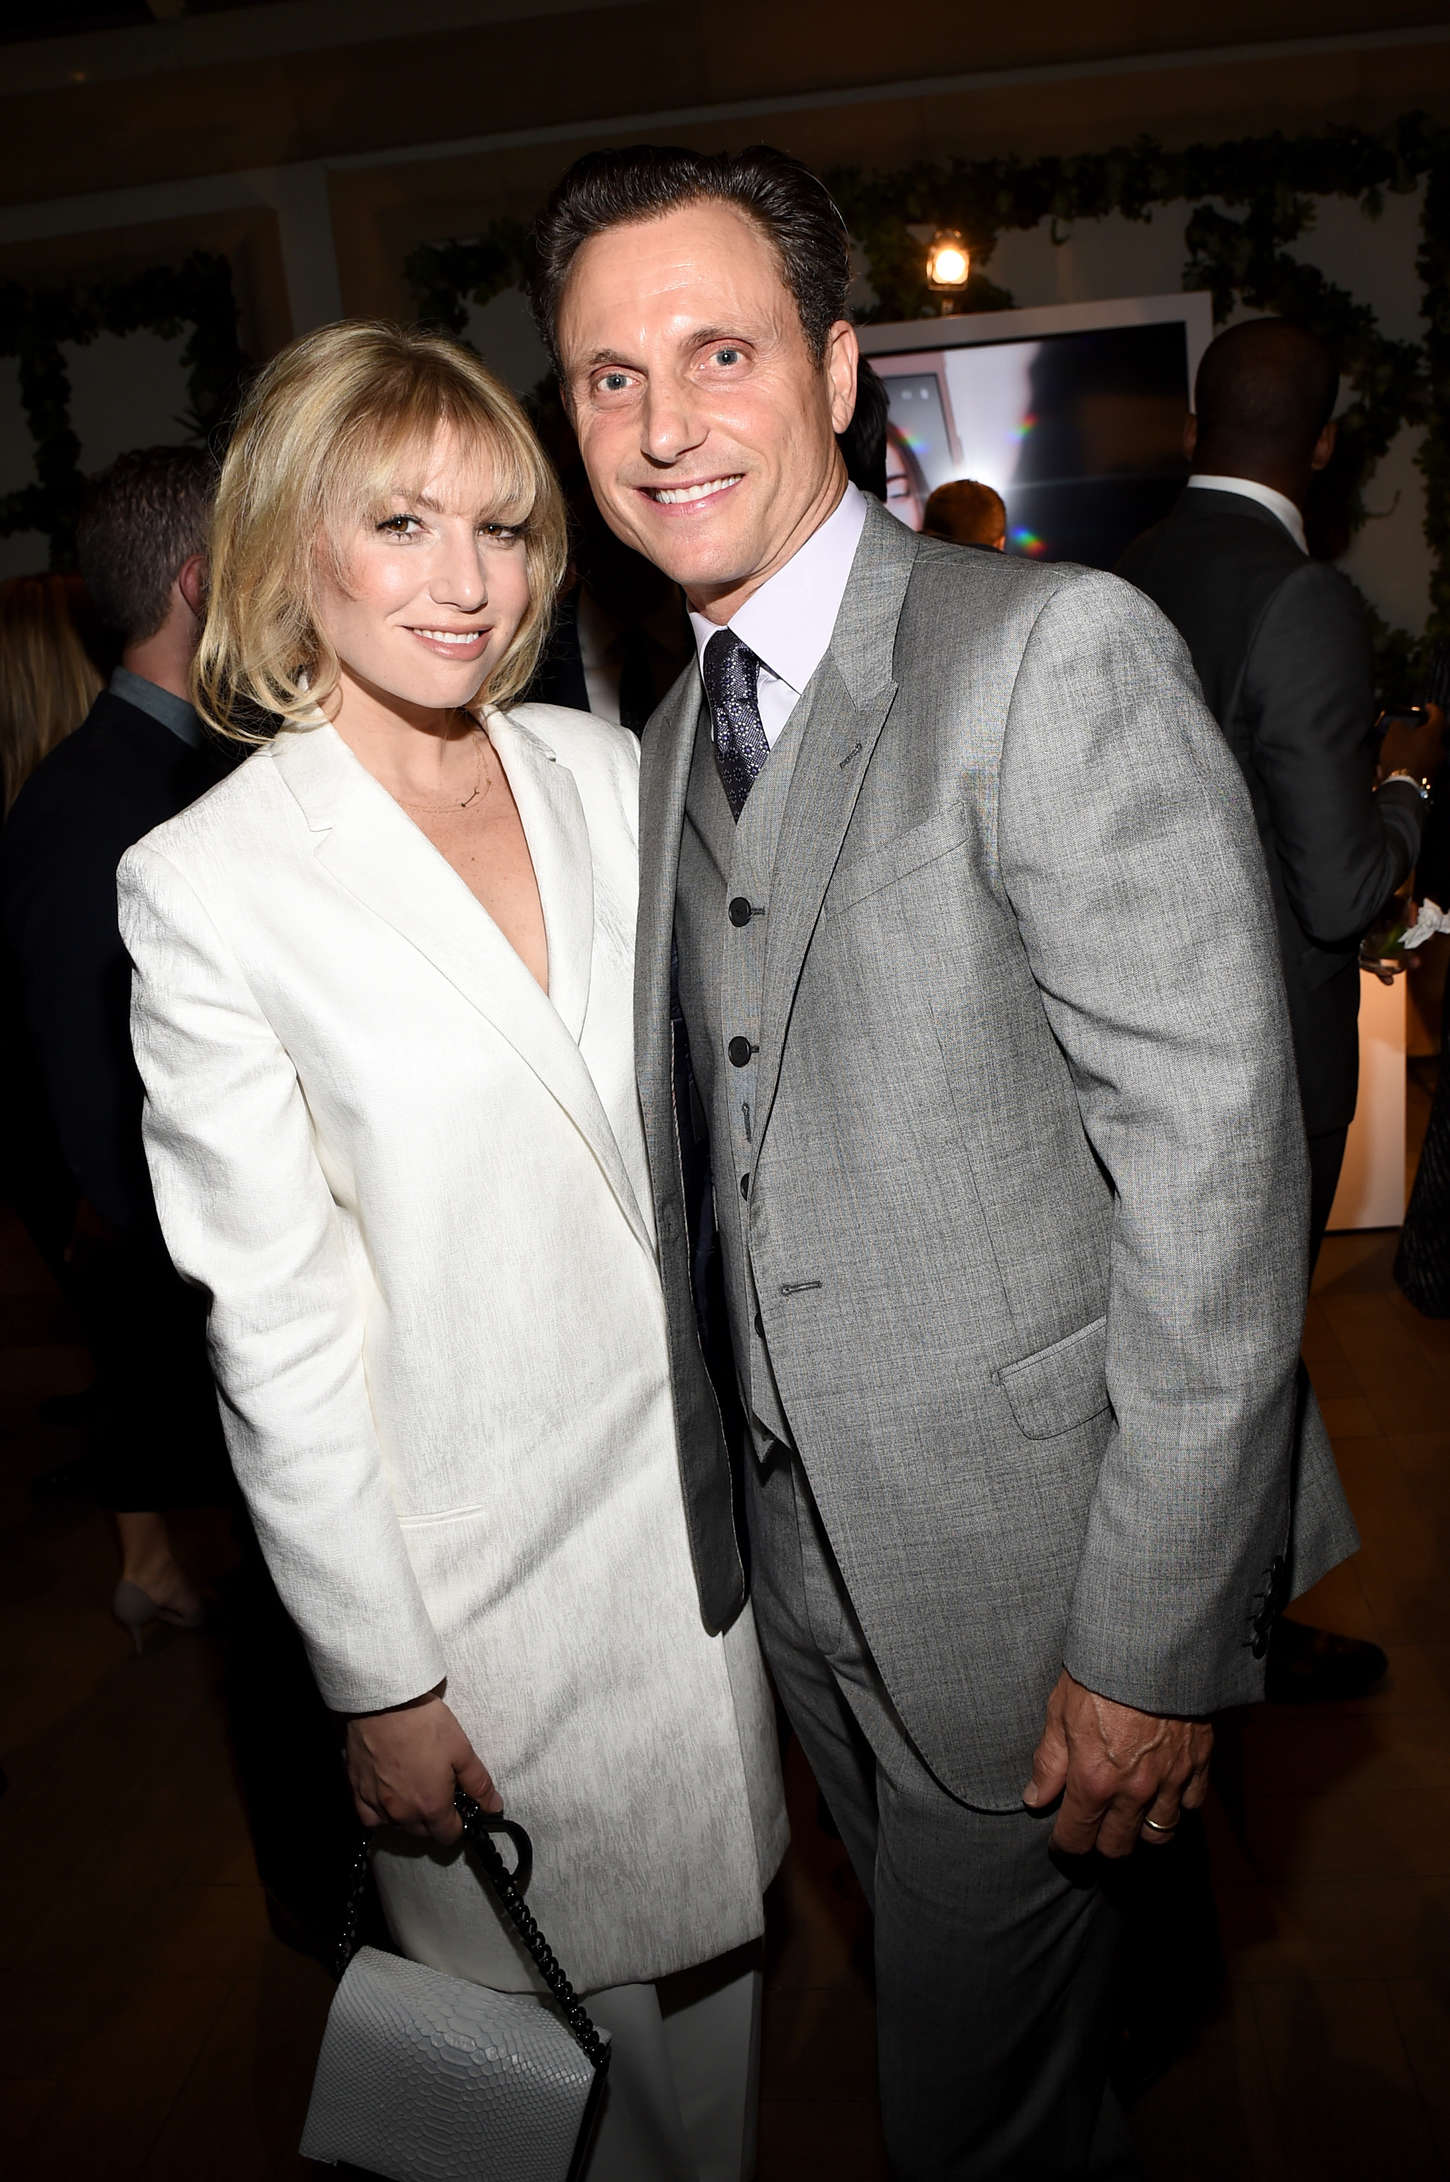 Ari Graynor ELLEs annual Women In Hollywood Awards in Los Angeles